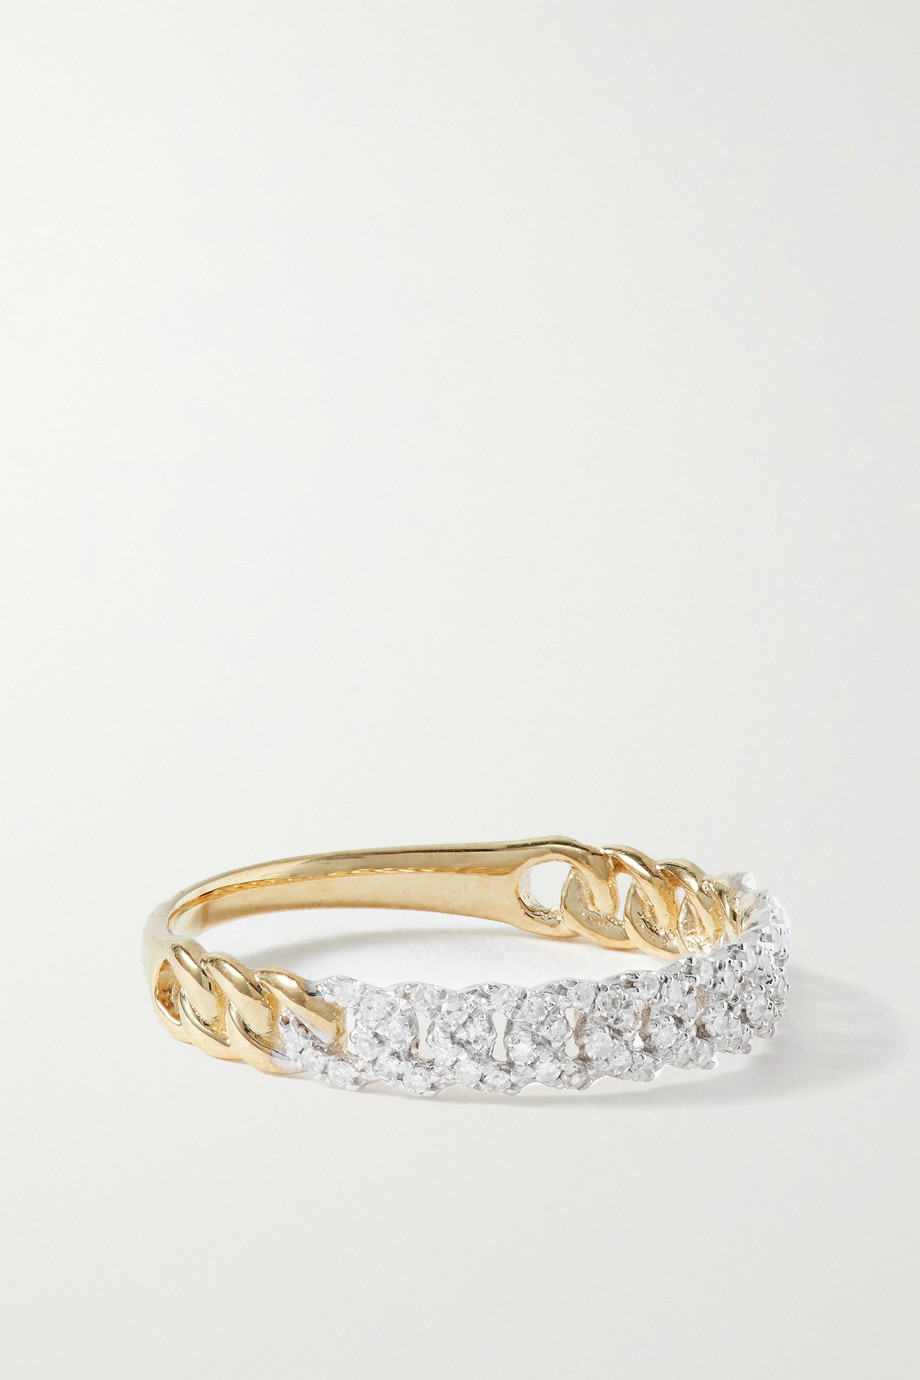 STONE AND STRAND Bague en or 10 carats (416/1000) et diamants